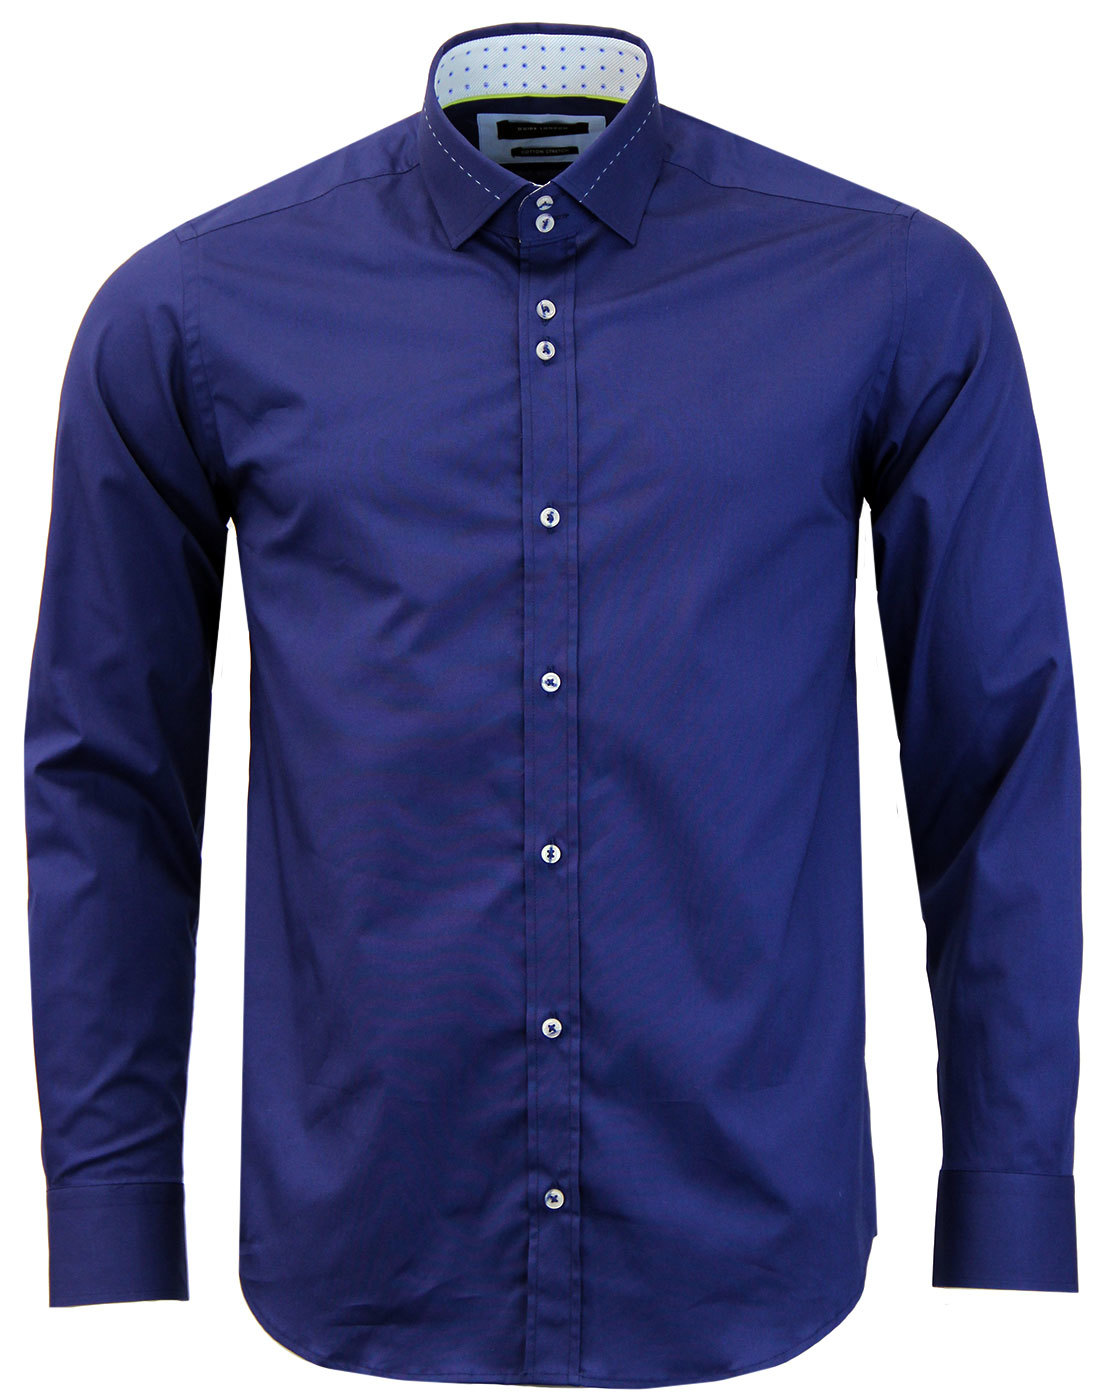 GUIDE LONDON Retro Mod Stitch Collar Smart Shirt N